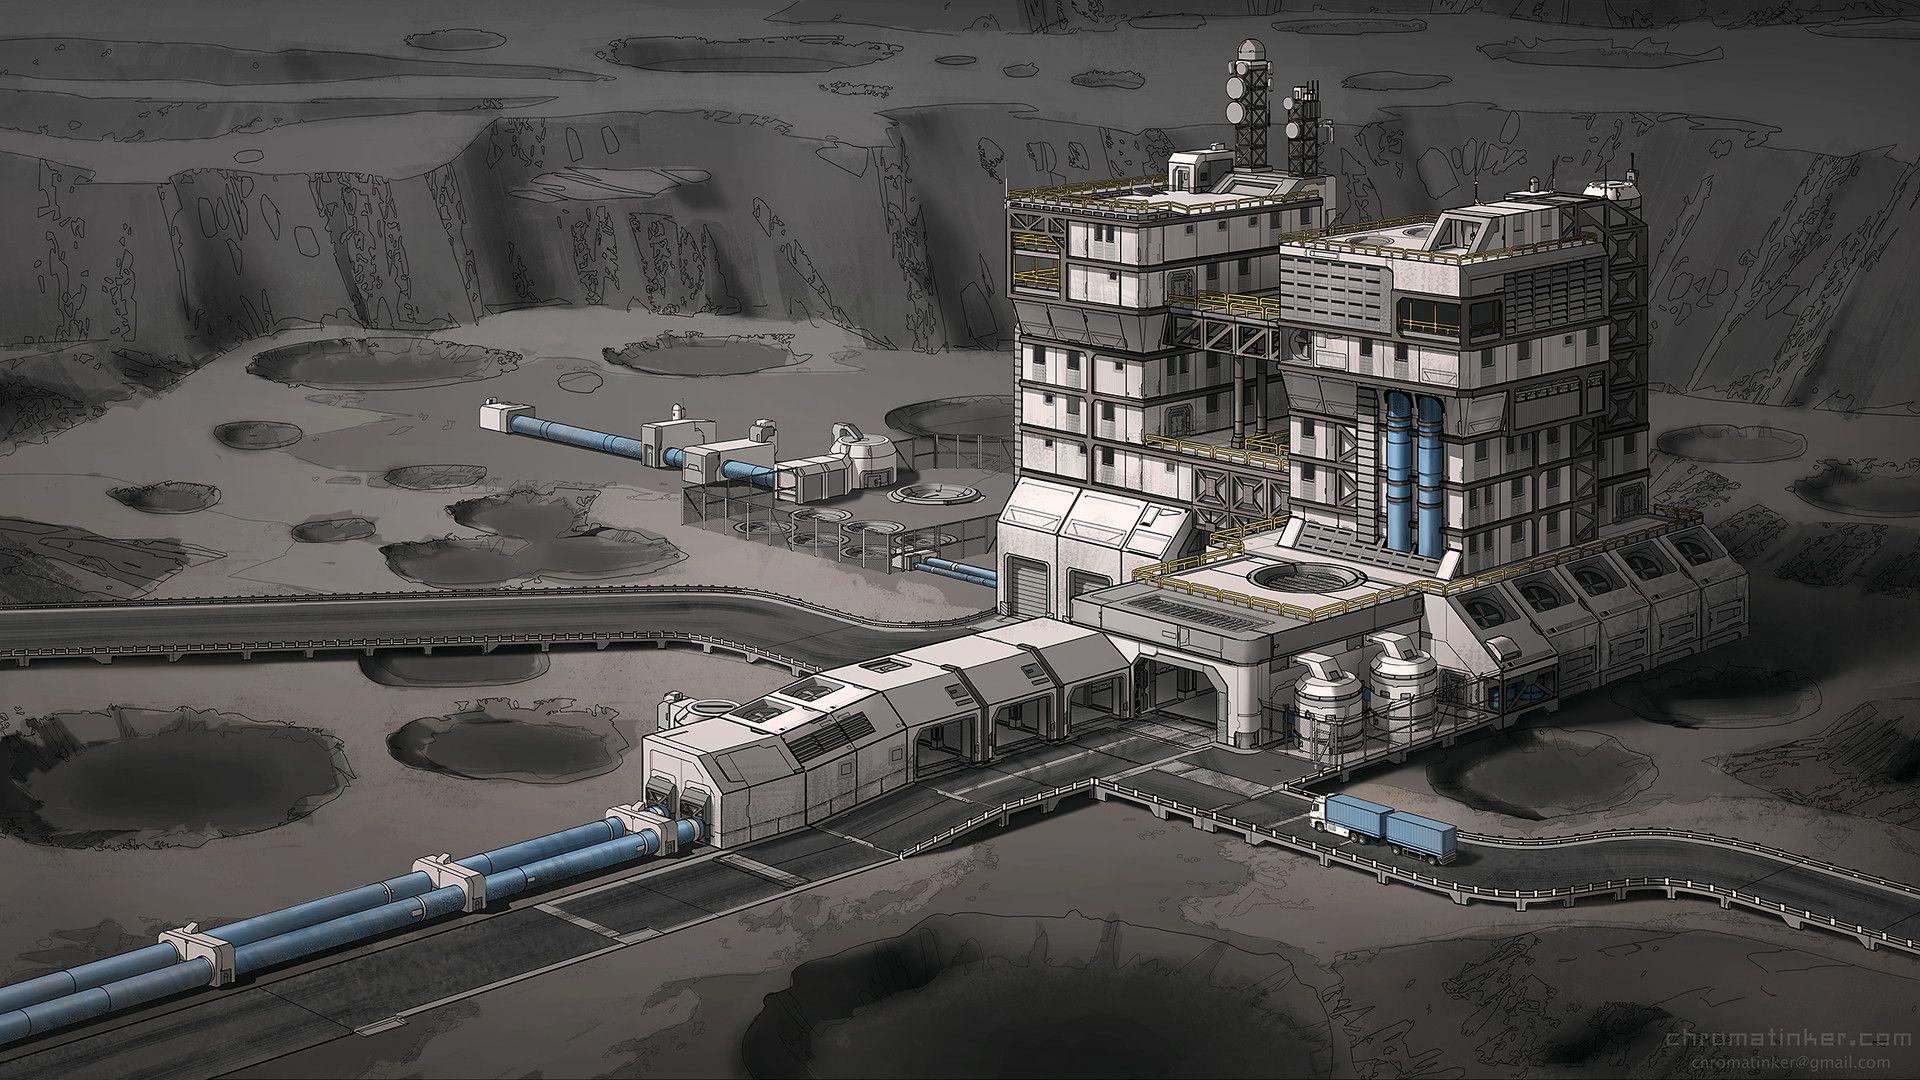 ArtStation - Exoplanet Factory, Adam Taylor   Of Mythic ...